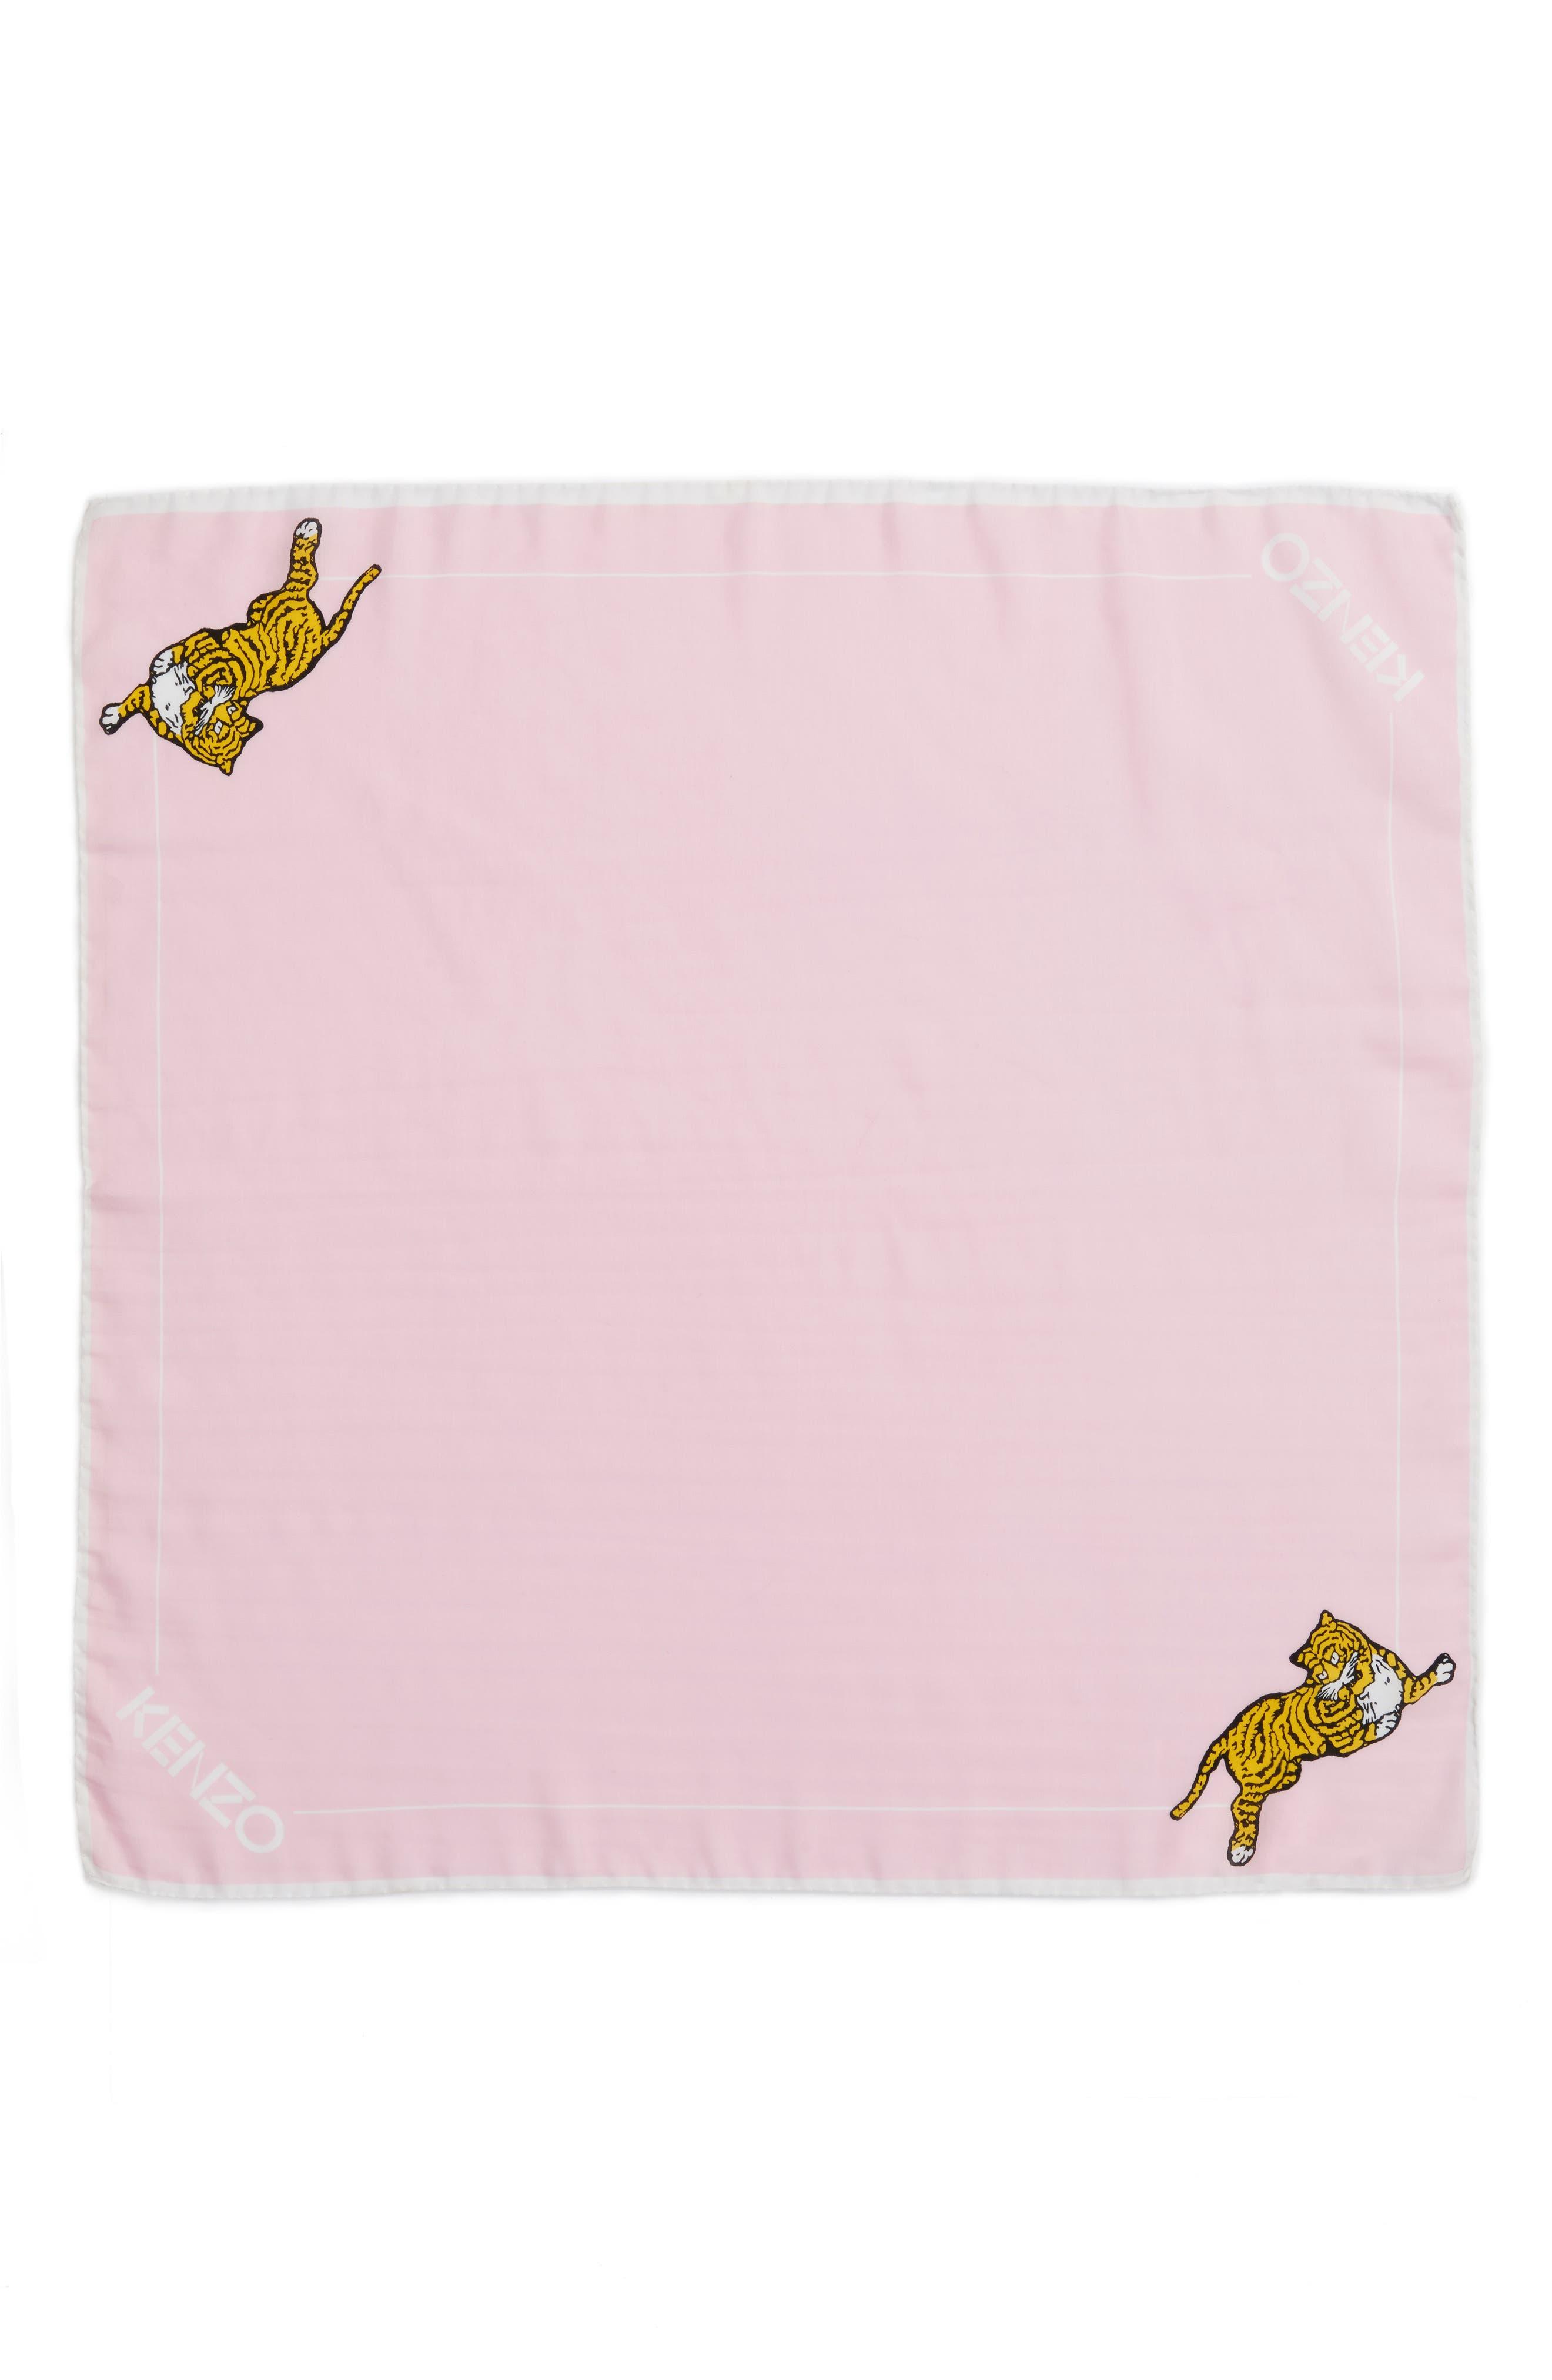 Walking Tiger Bandana Cotton & Silk Scarf,                         Main,                         color, Faded Pink